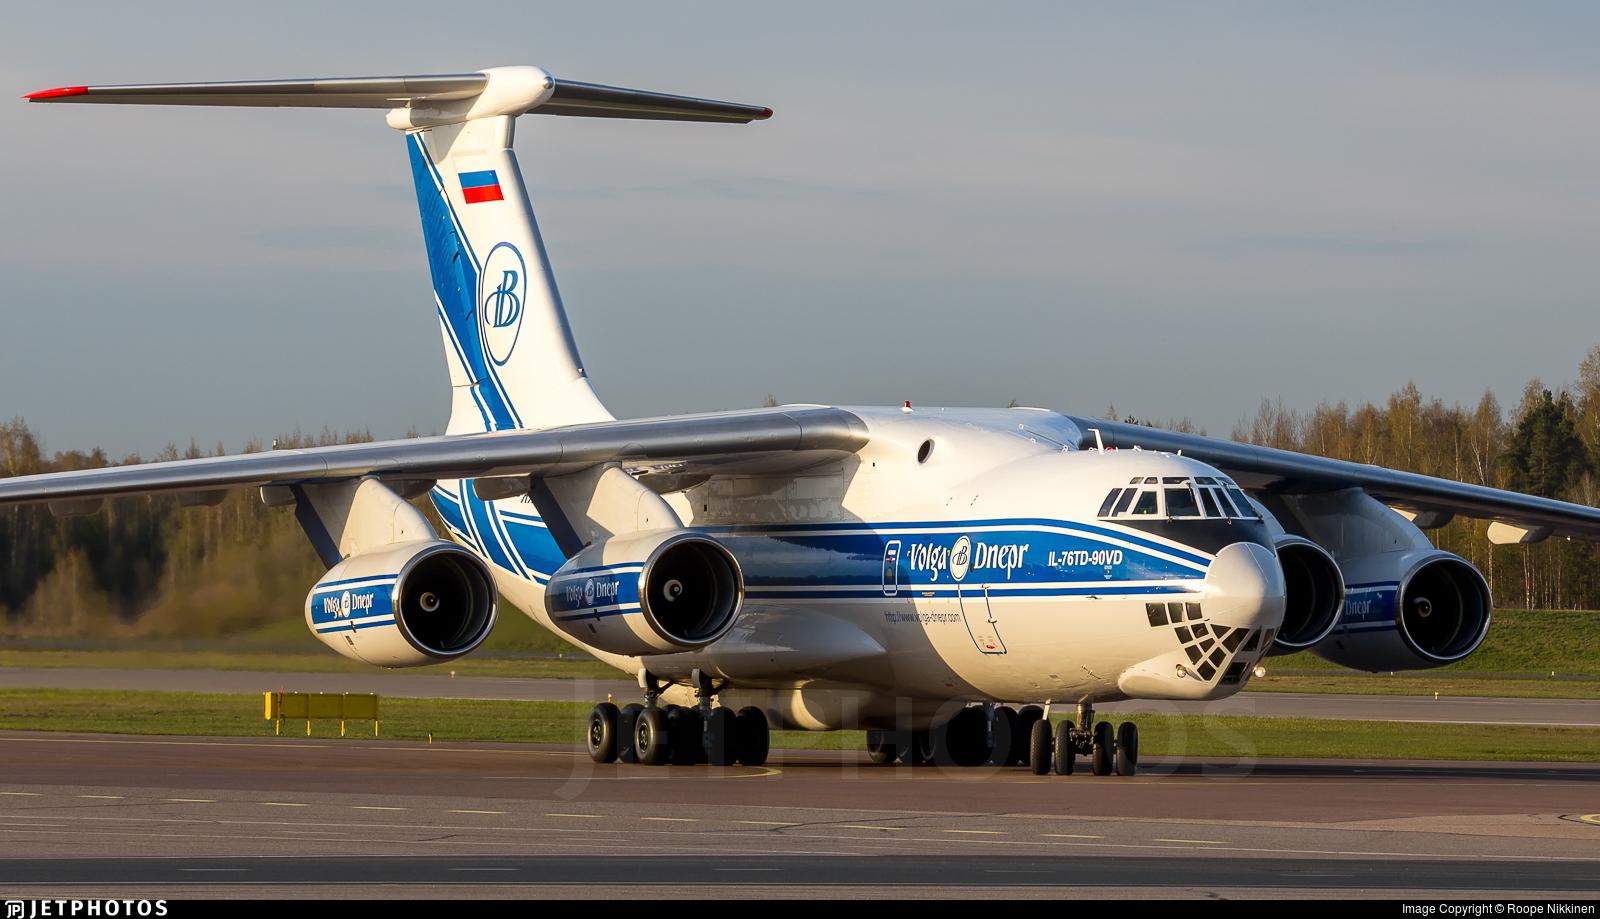 RA-76511 - Ilyushin IL-76TD-90VD - Volga Dnepr Airlines